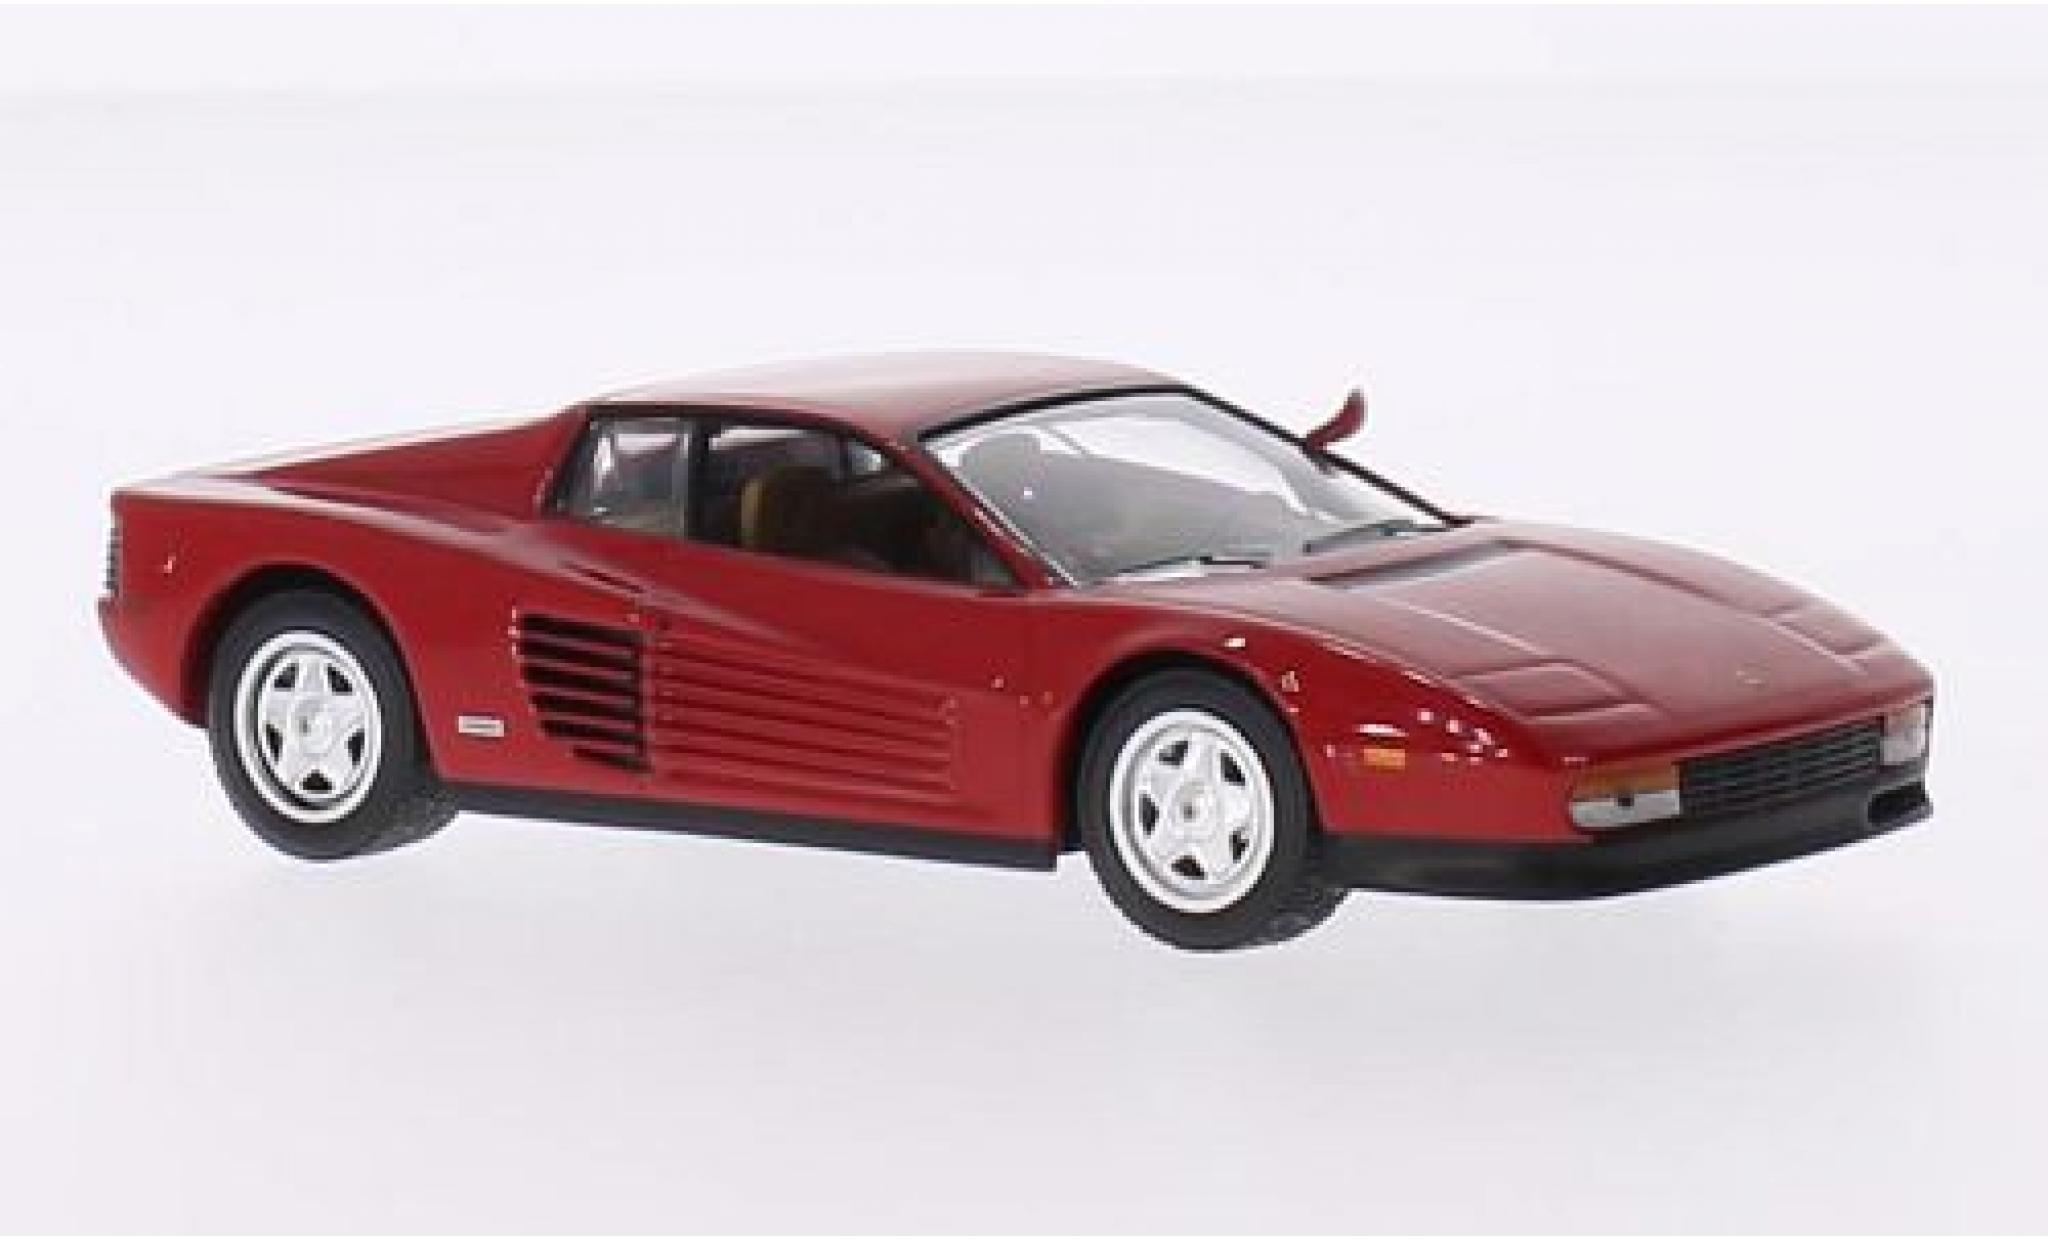 Ferrari Testarossa 1/43 SpecialC 59 rouge sans Vitrine